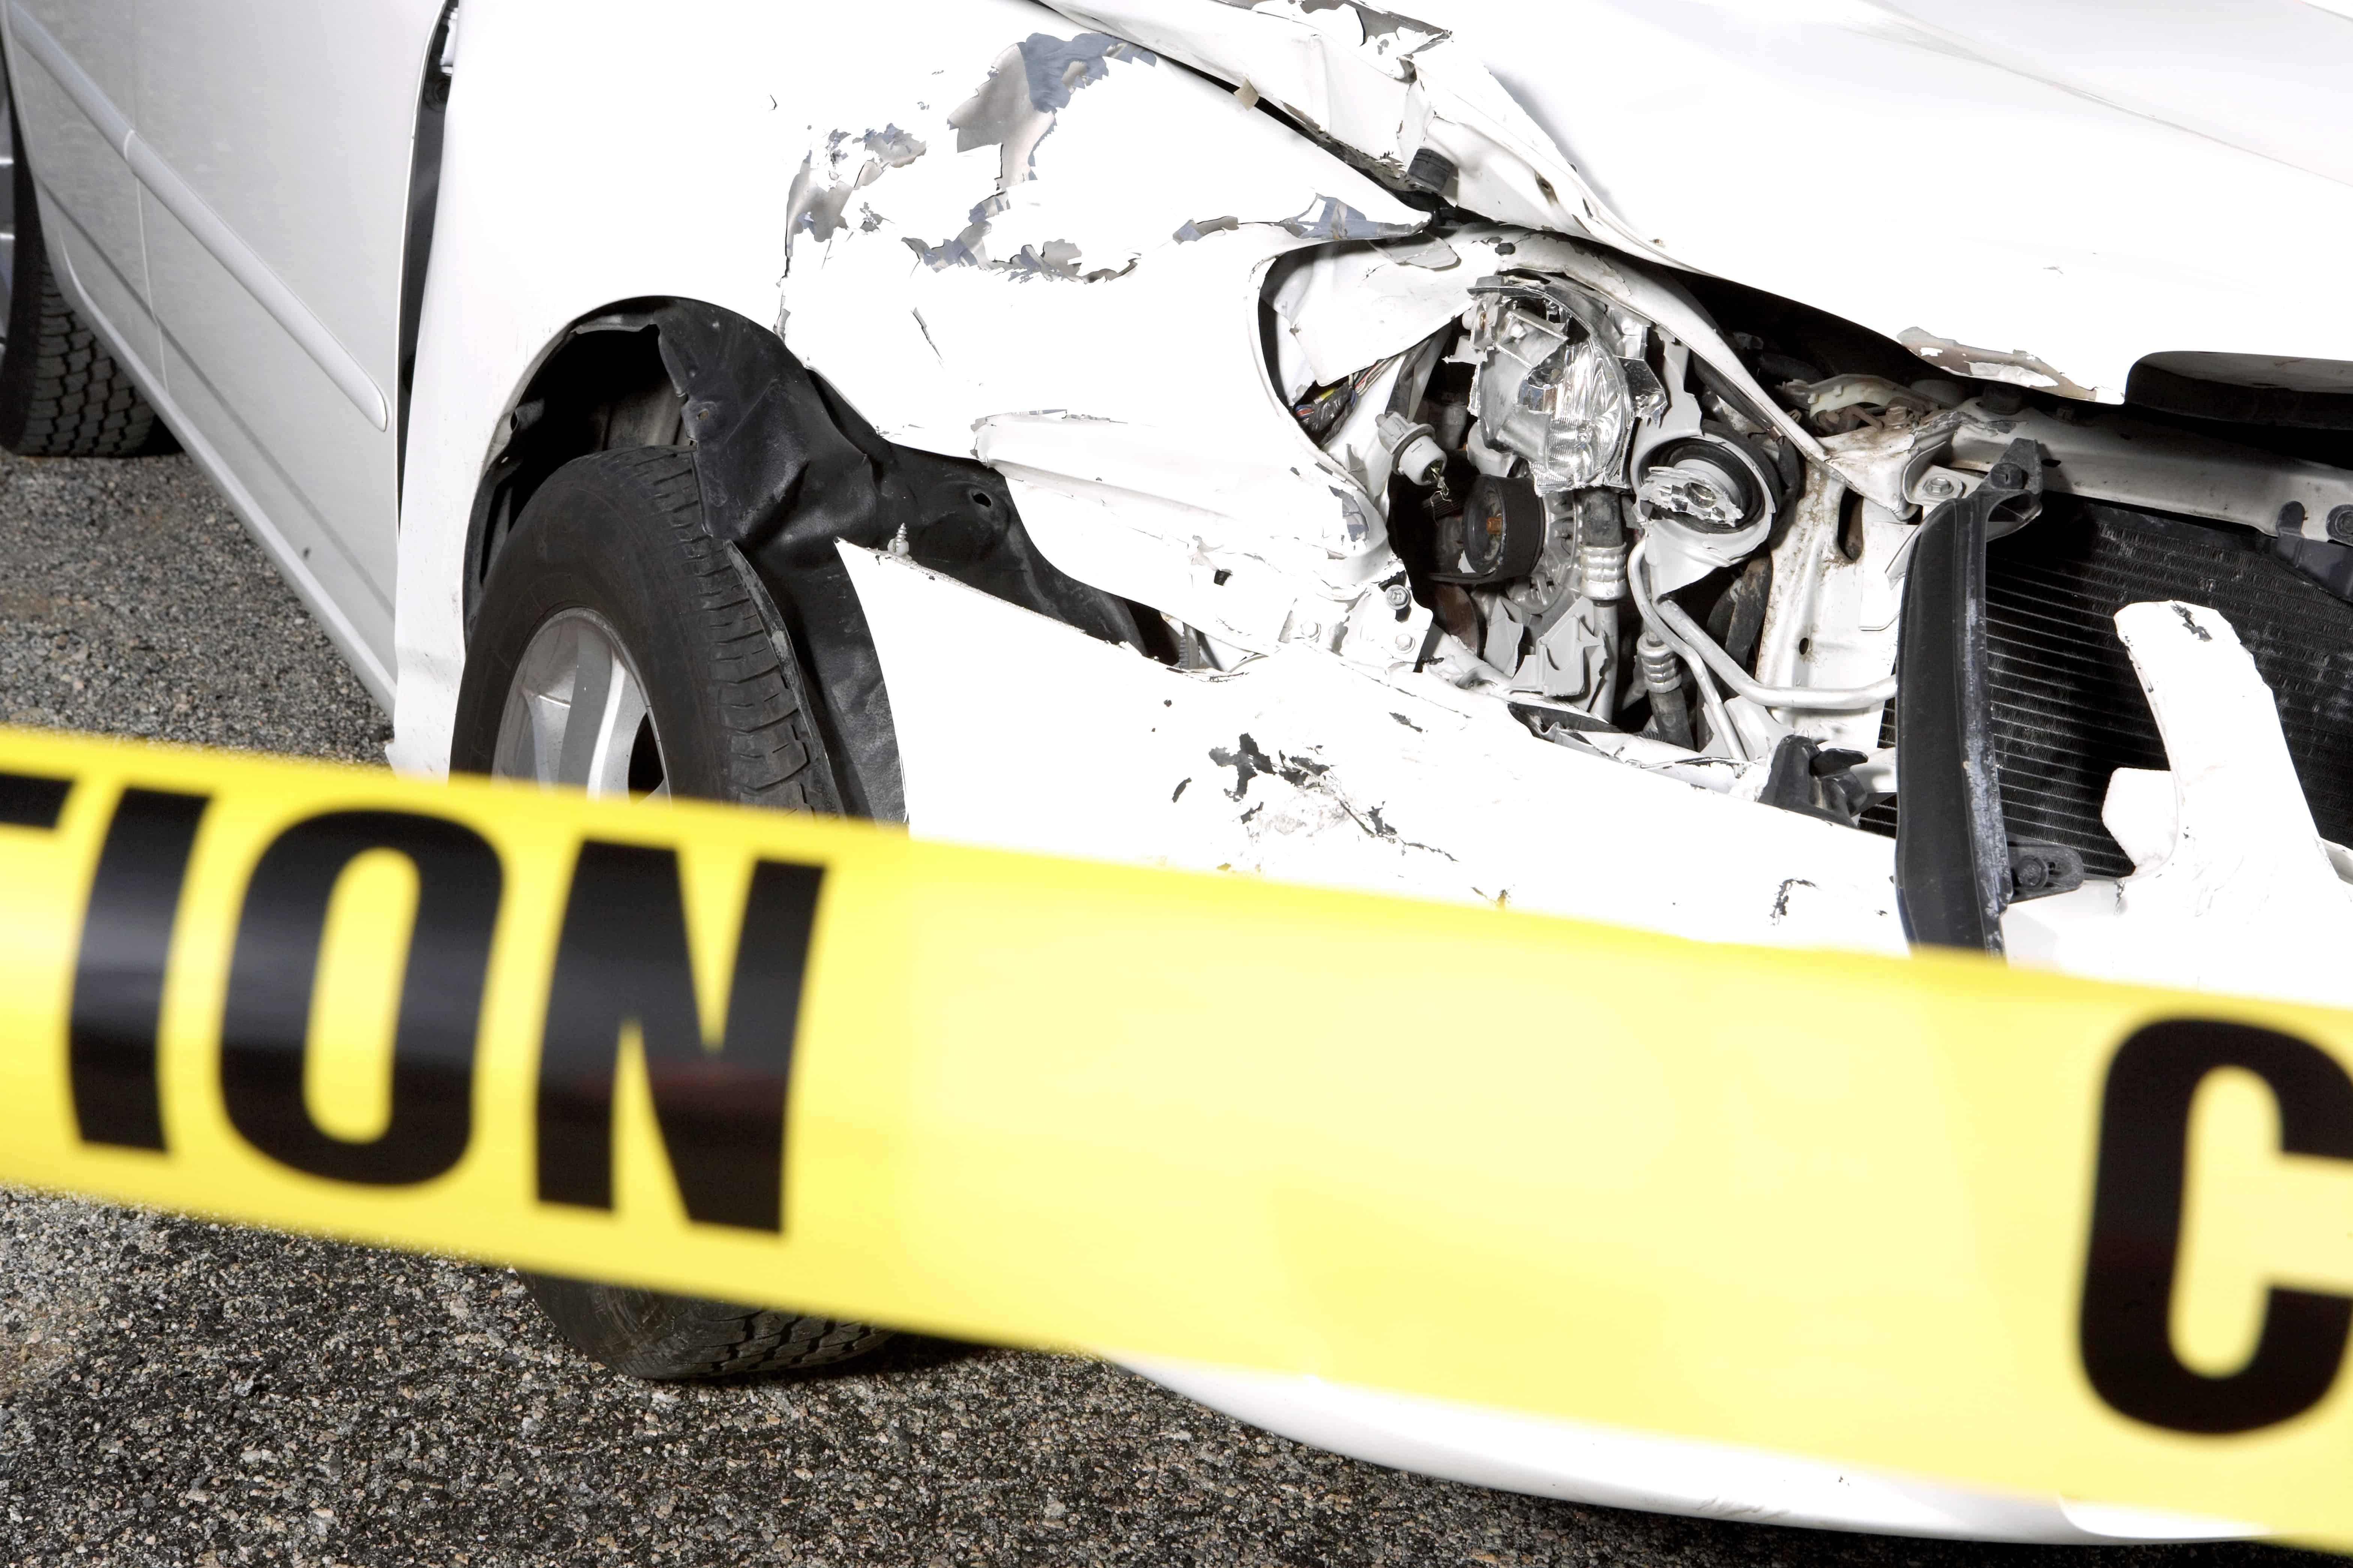 Krisanne Caciola and 8-Year-Old Girl Injured, Samantha Hoobyar Arrested for DUI Two-Car Crash on Alamo Pintado Road [Santa Ynez Valley, CA]